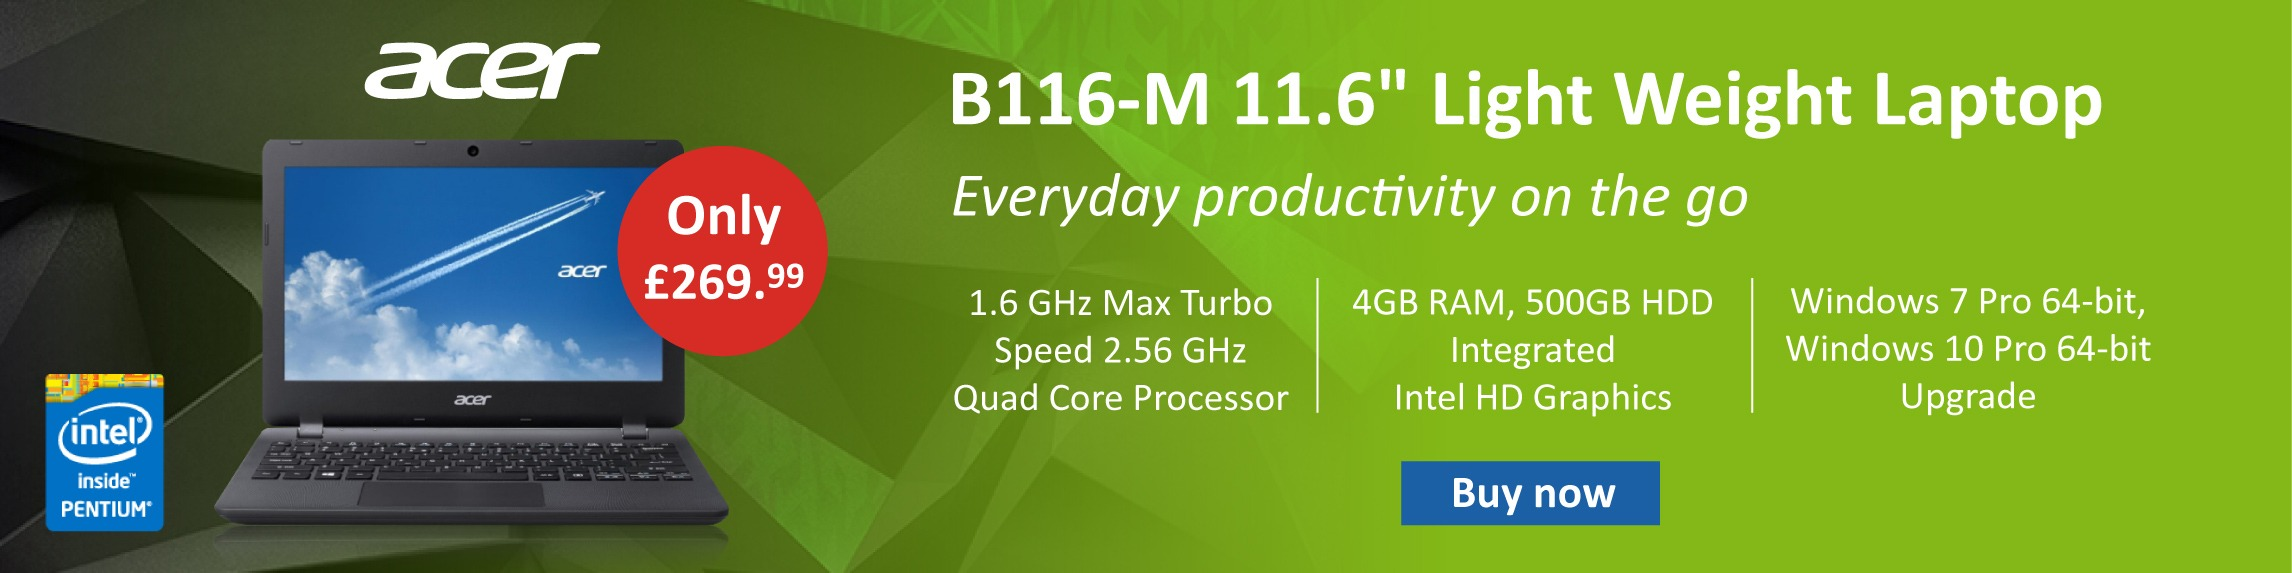 Acer B116-M